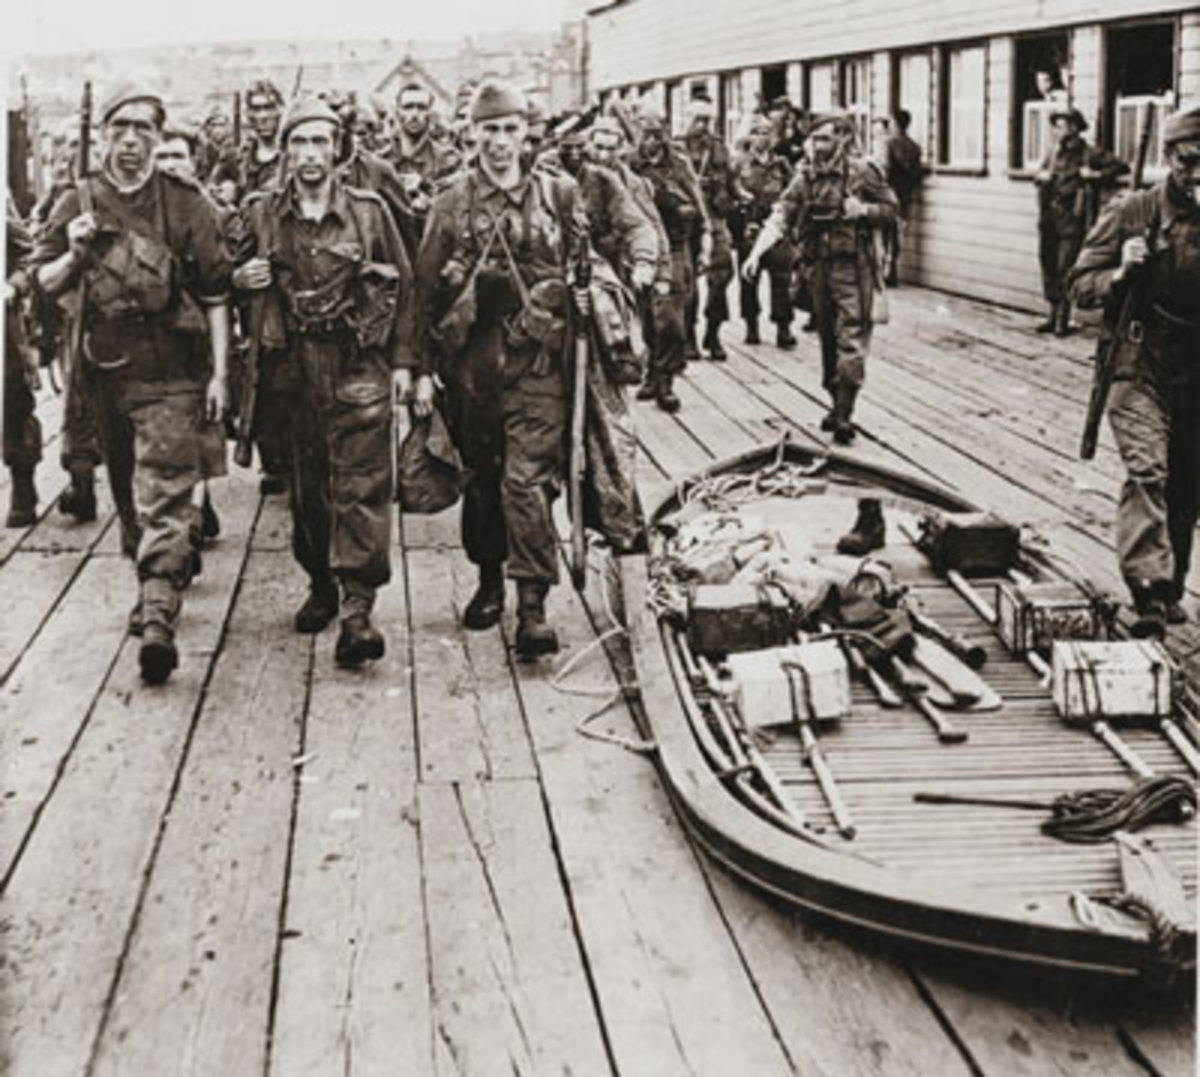 British Commando's ready to embark